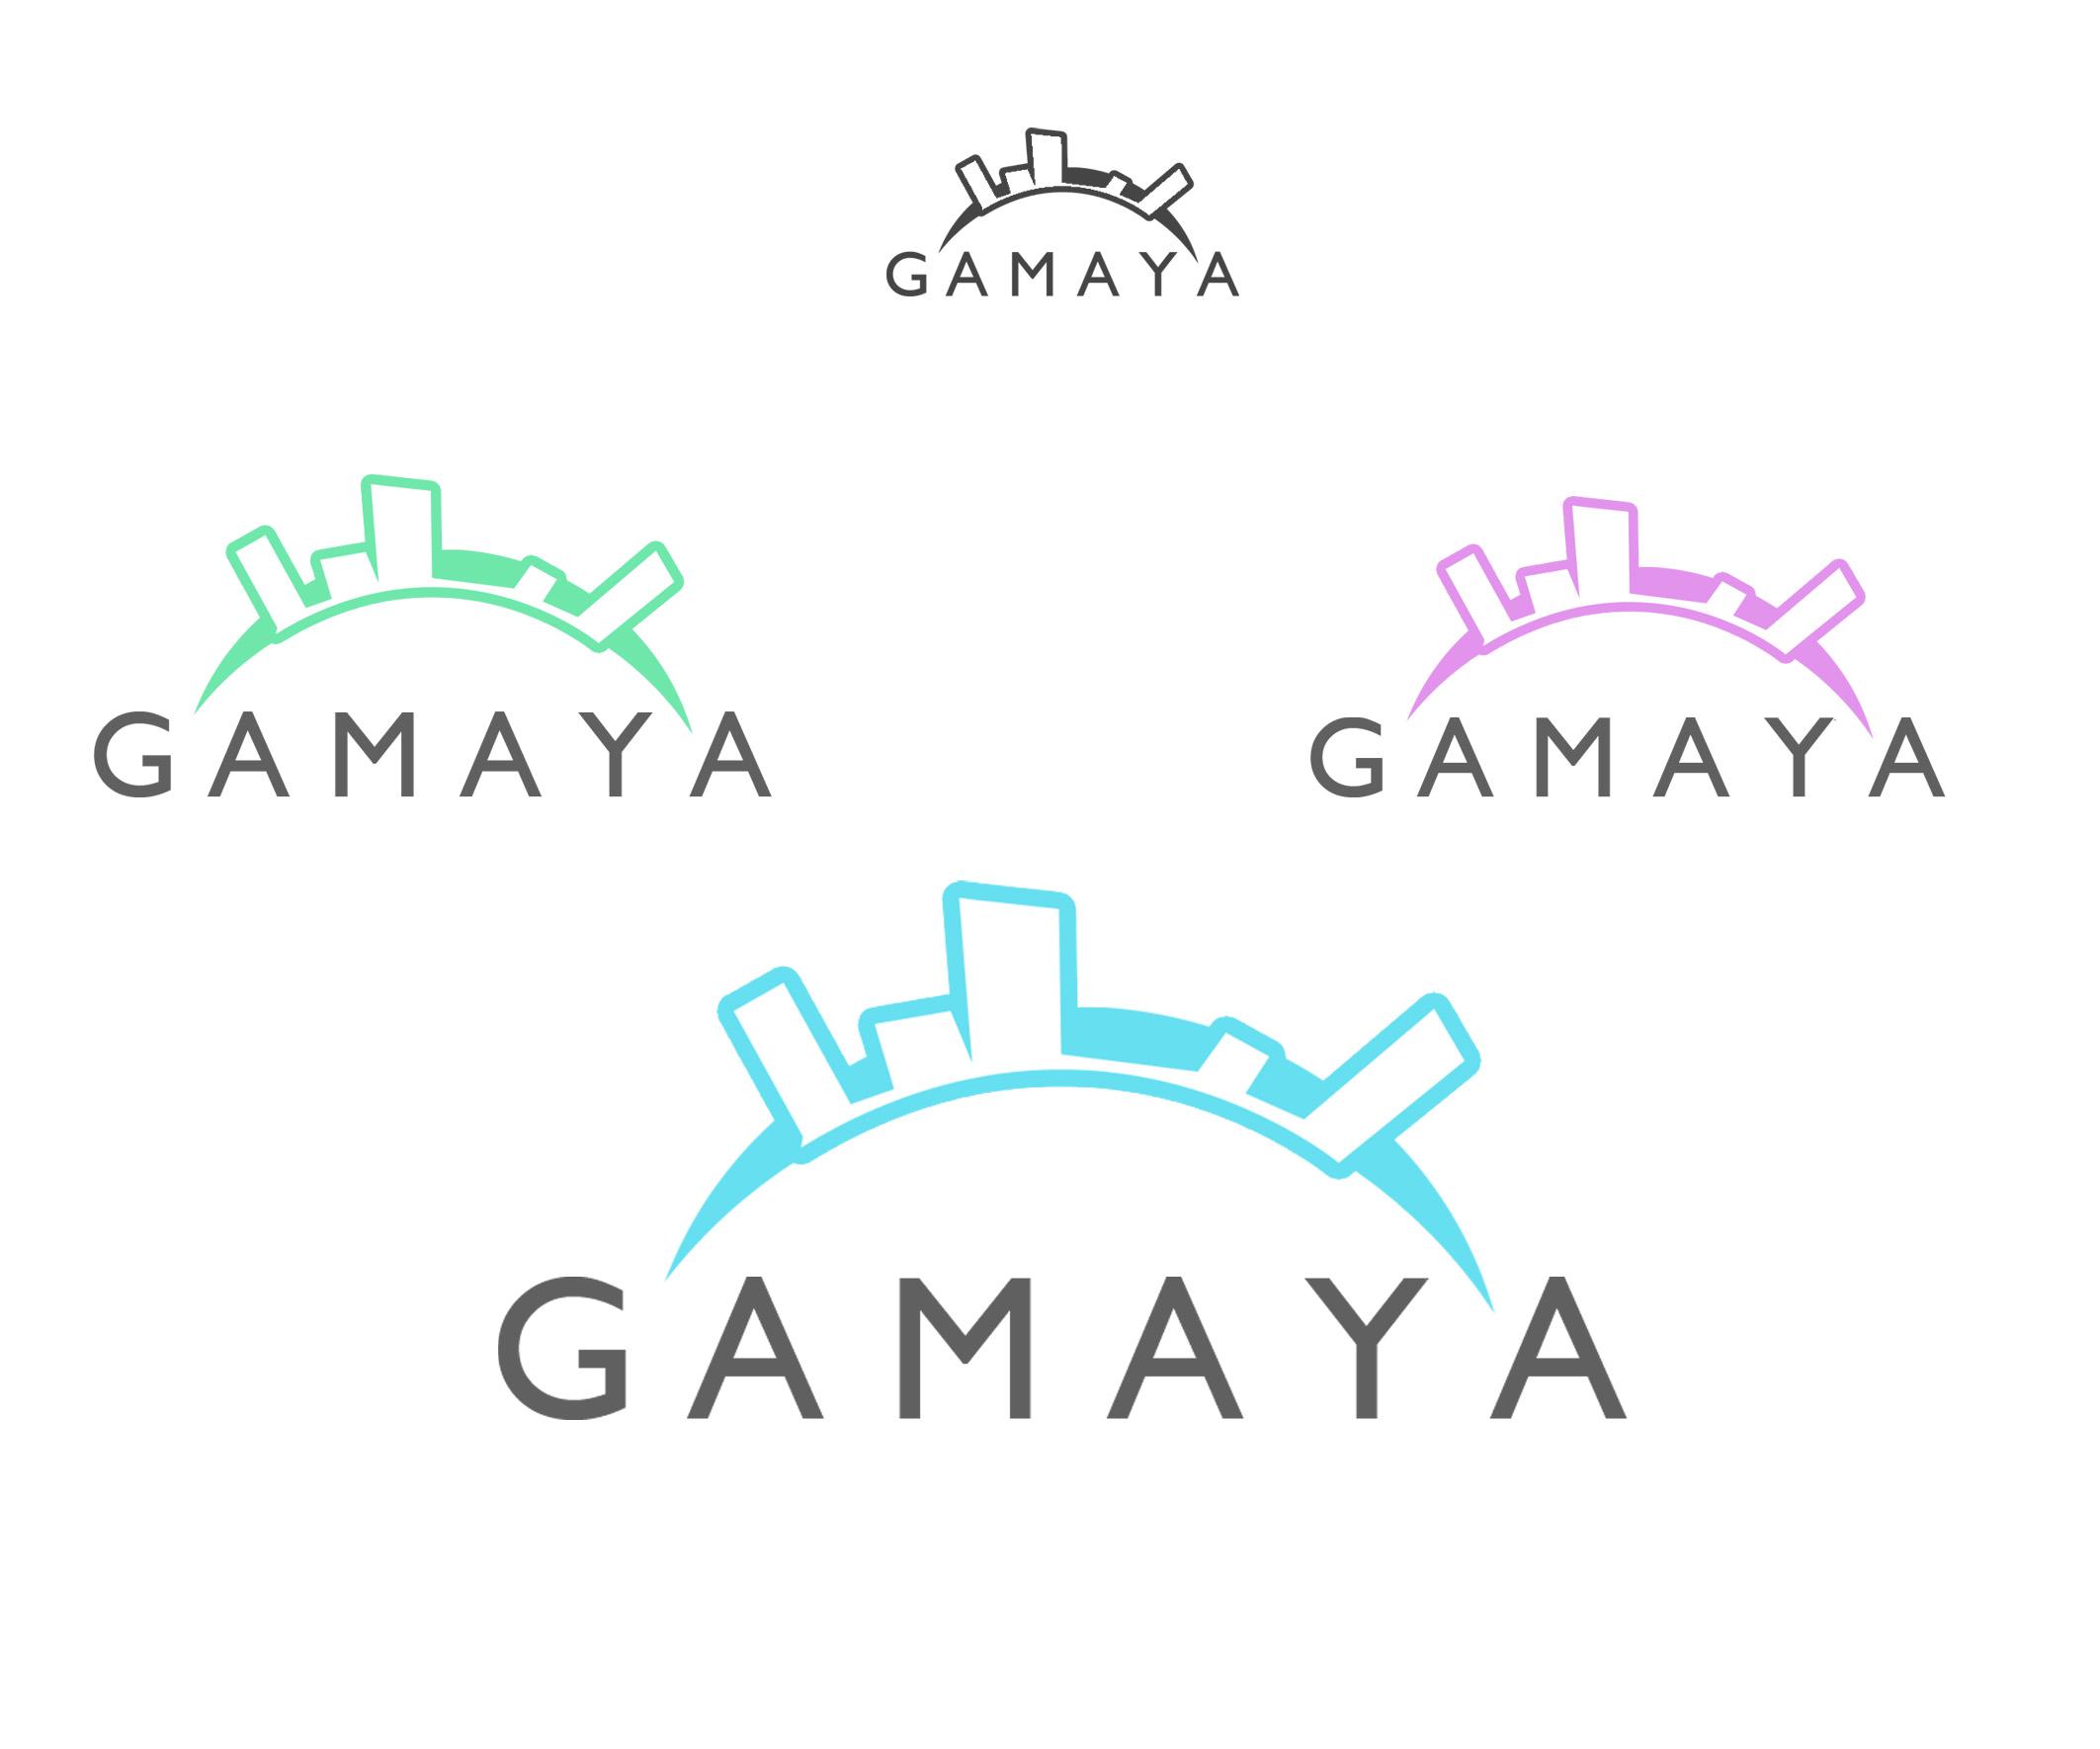 Разработка логотипа для компании Gamaya фото f_7255481165e57c89.jpg